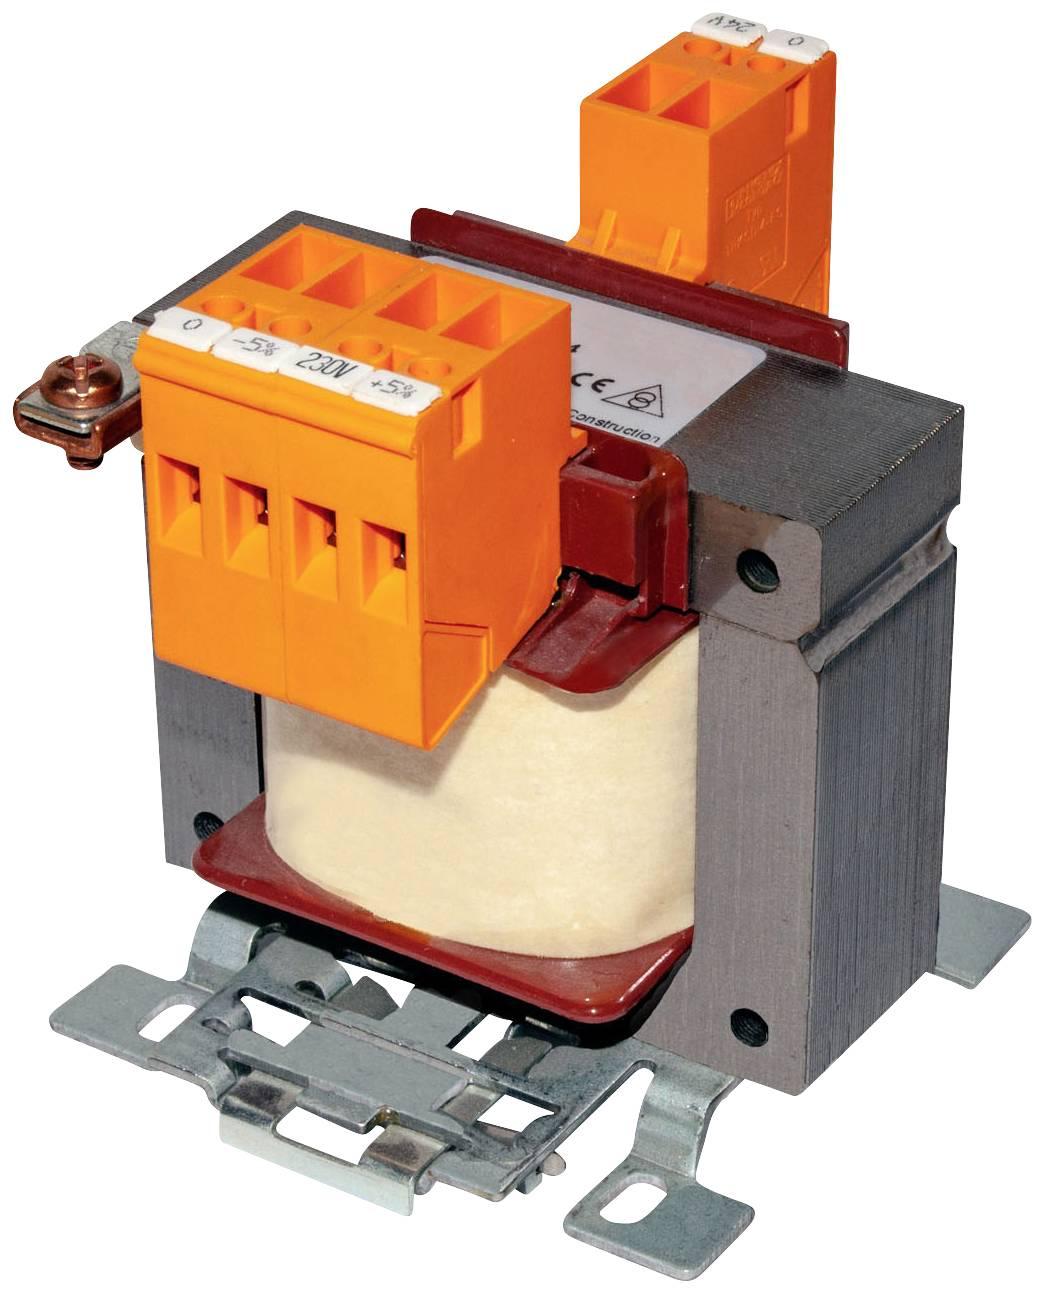 Riadiaci transformátor Weiss Elektrotechnik WUSTTR 160/21230, 160 VA